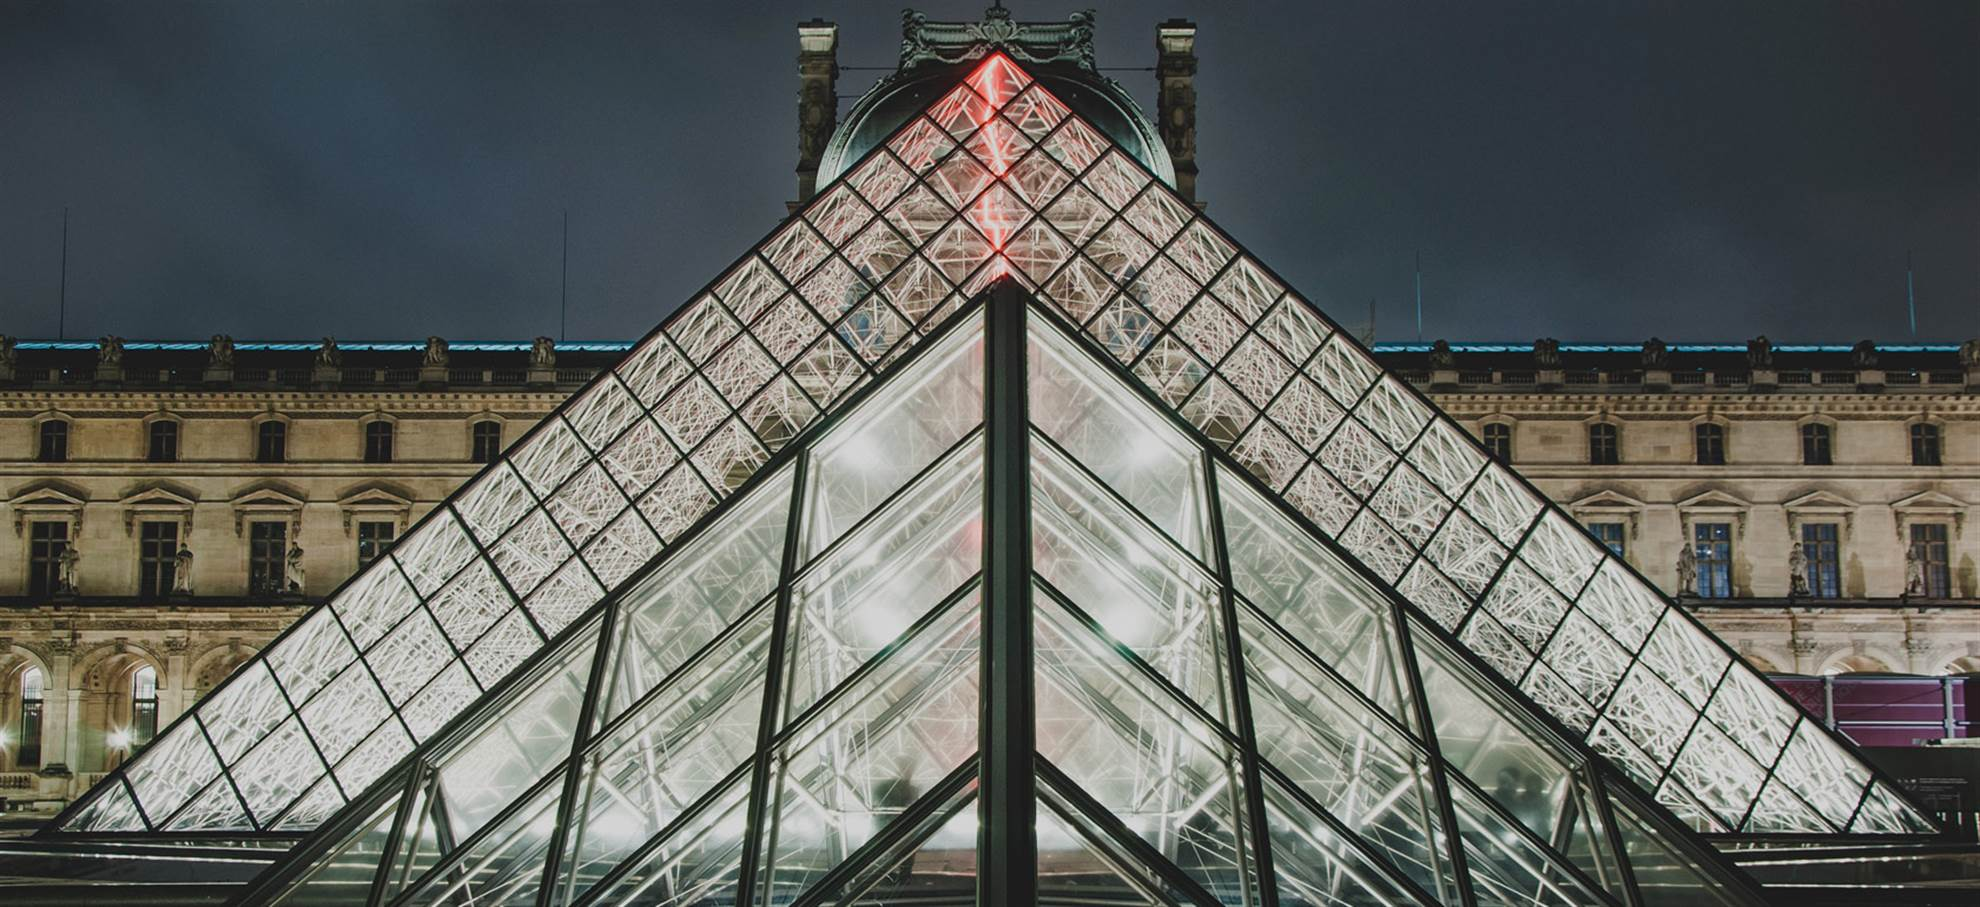 Музей Лувр (Louvre Museum)